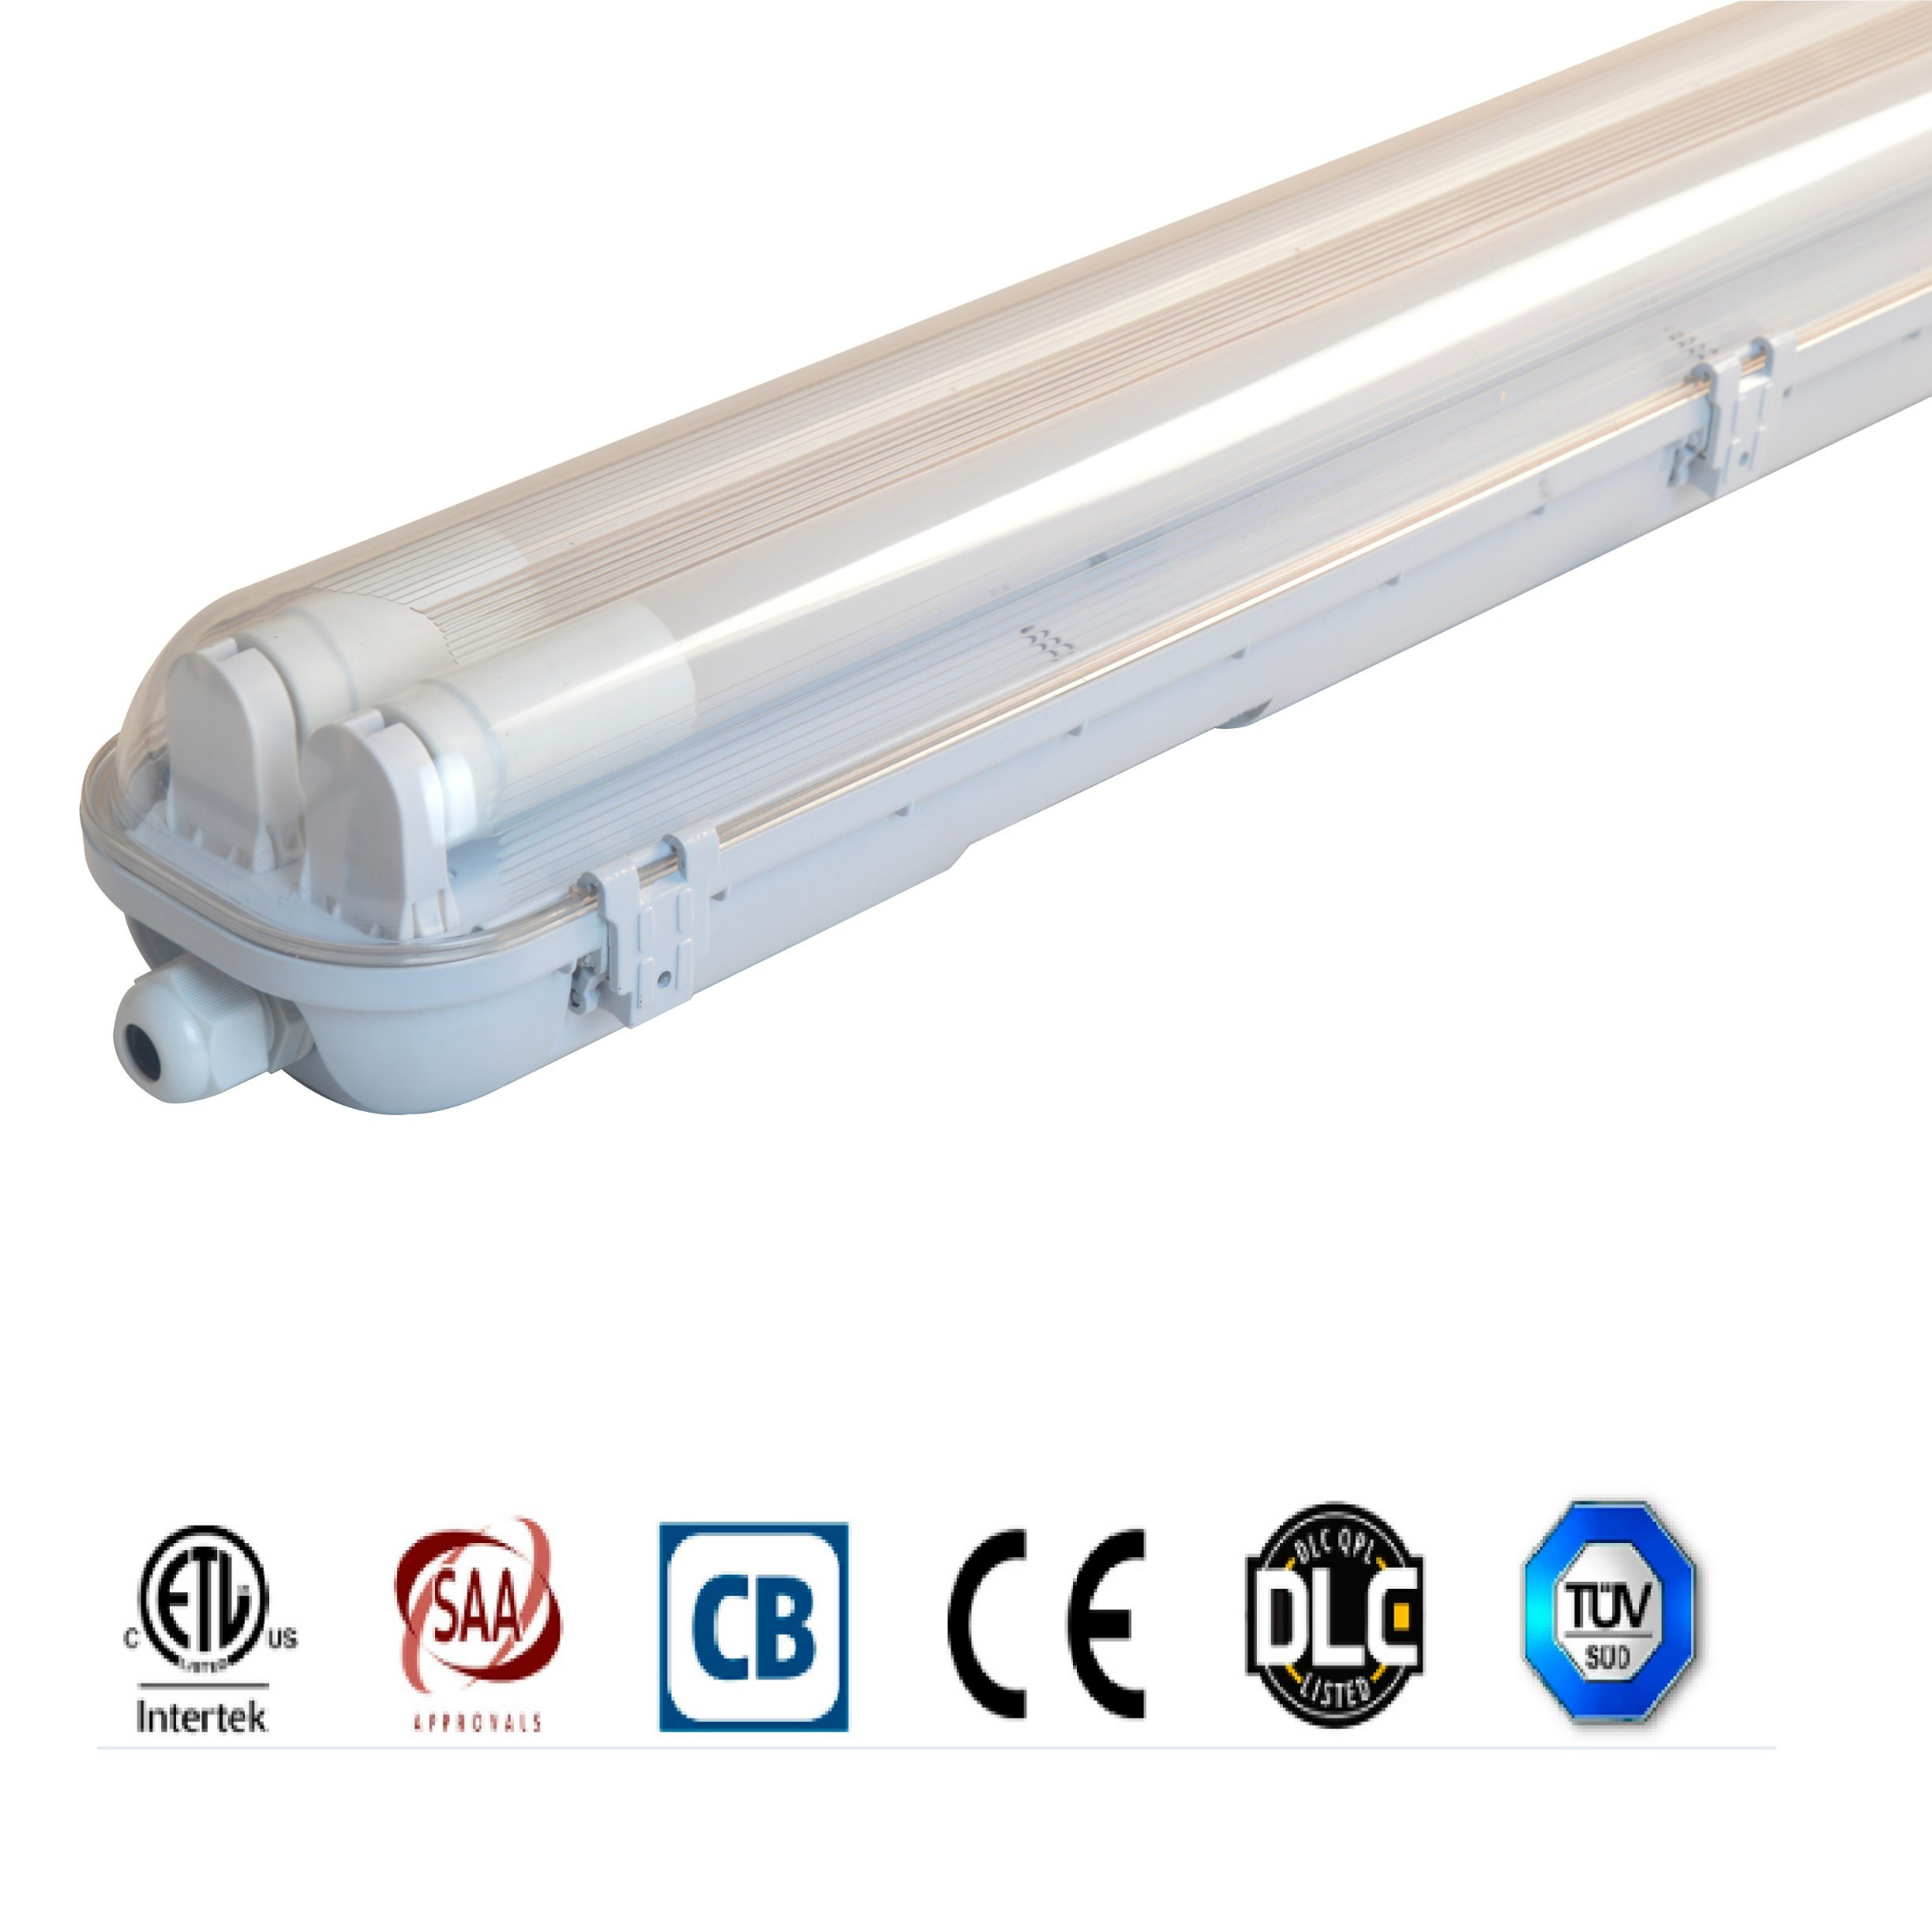 uk availability 692c1 d3cec [Hot Item] 2X36W Fluorescent Light Fittings